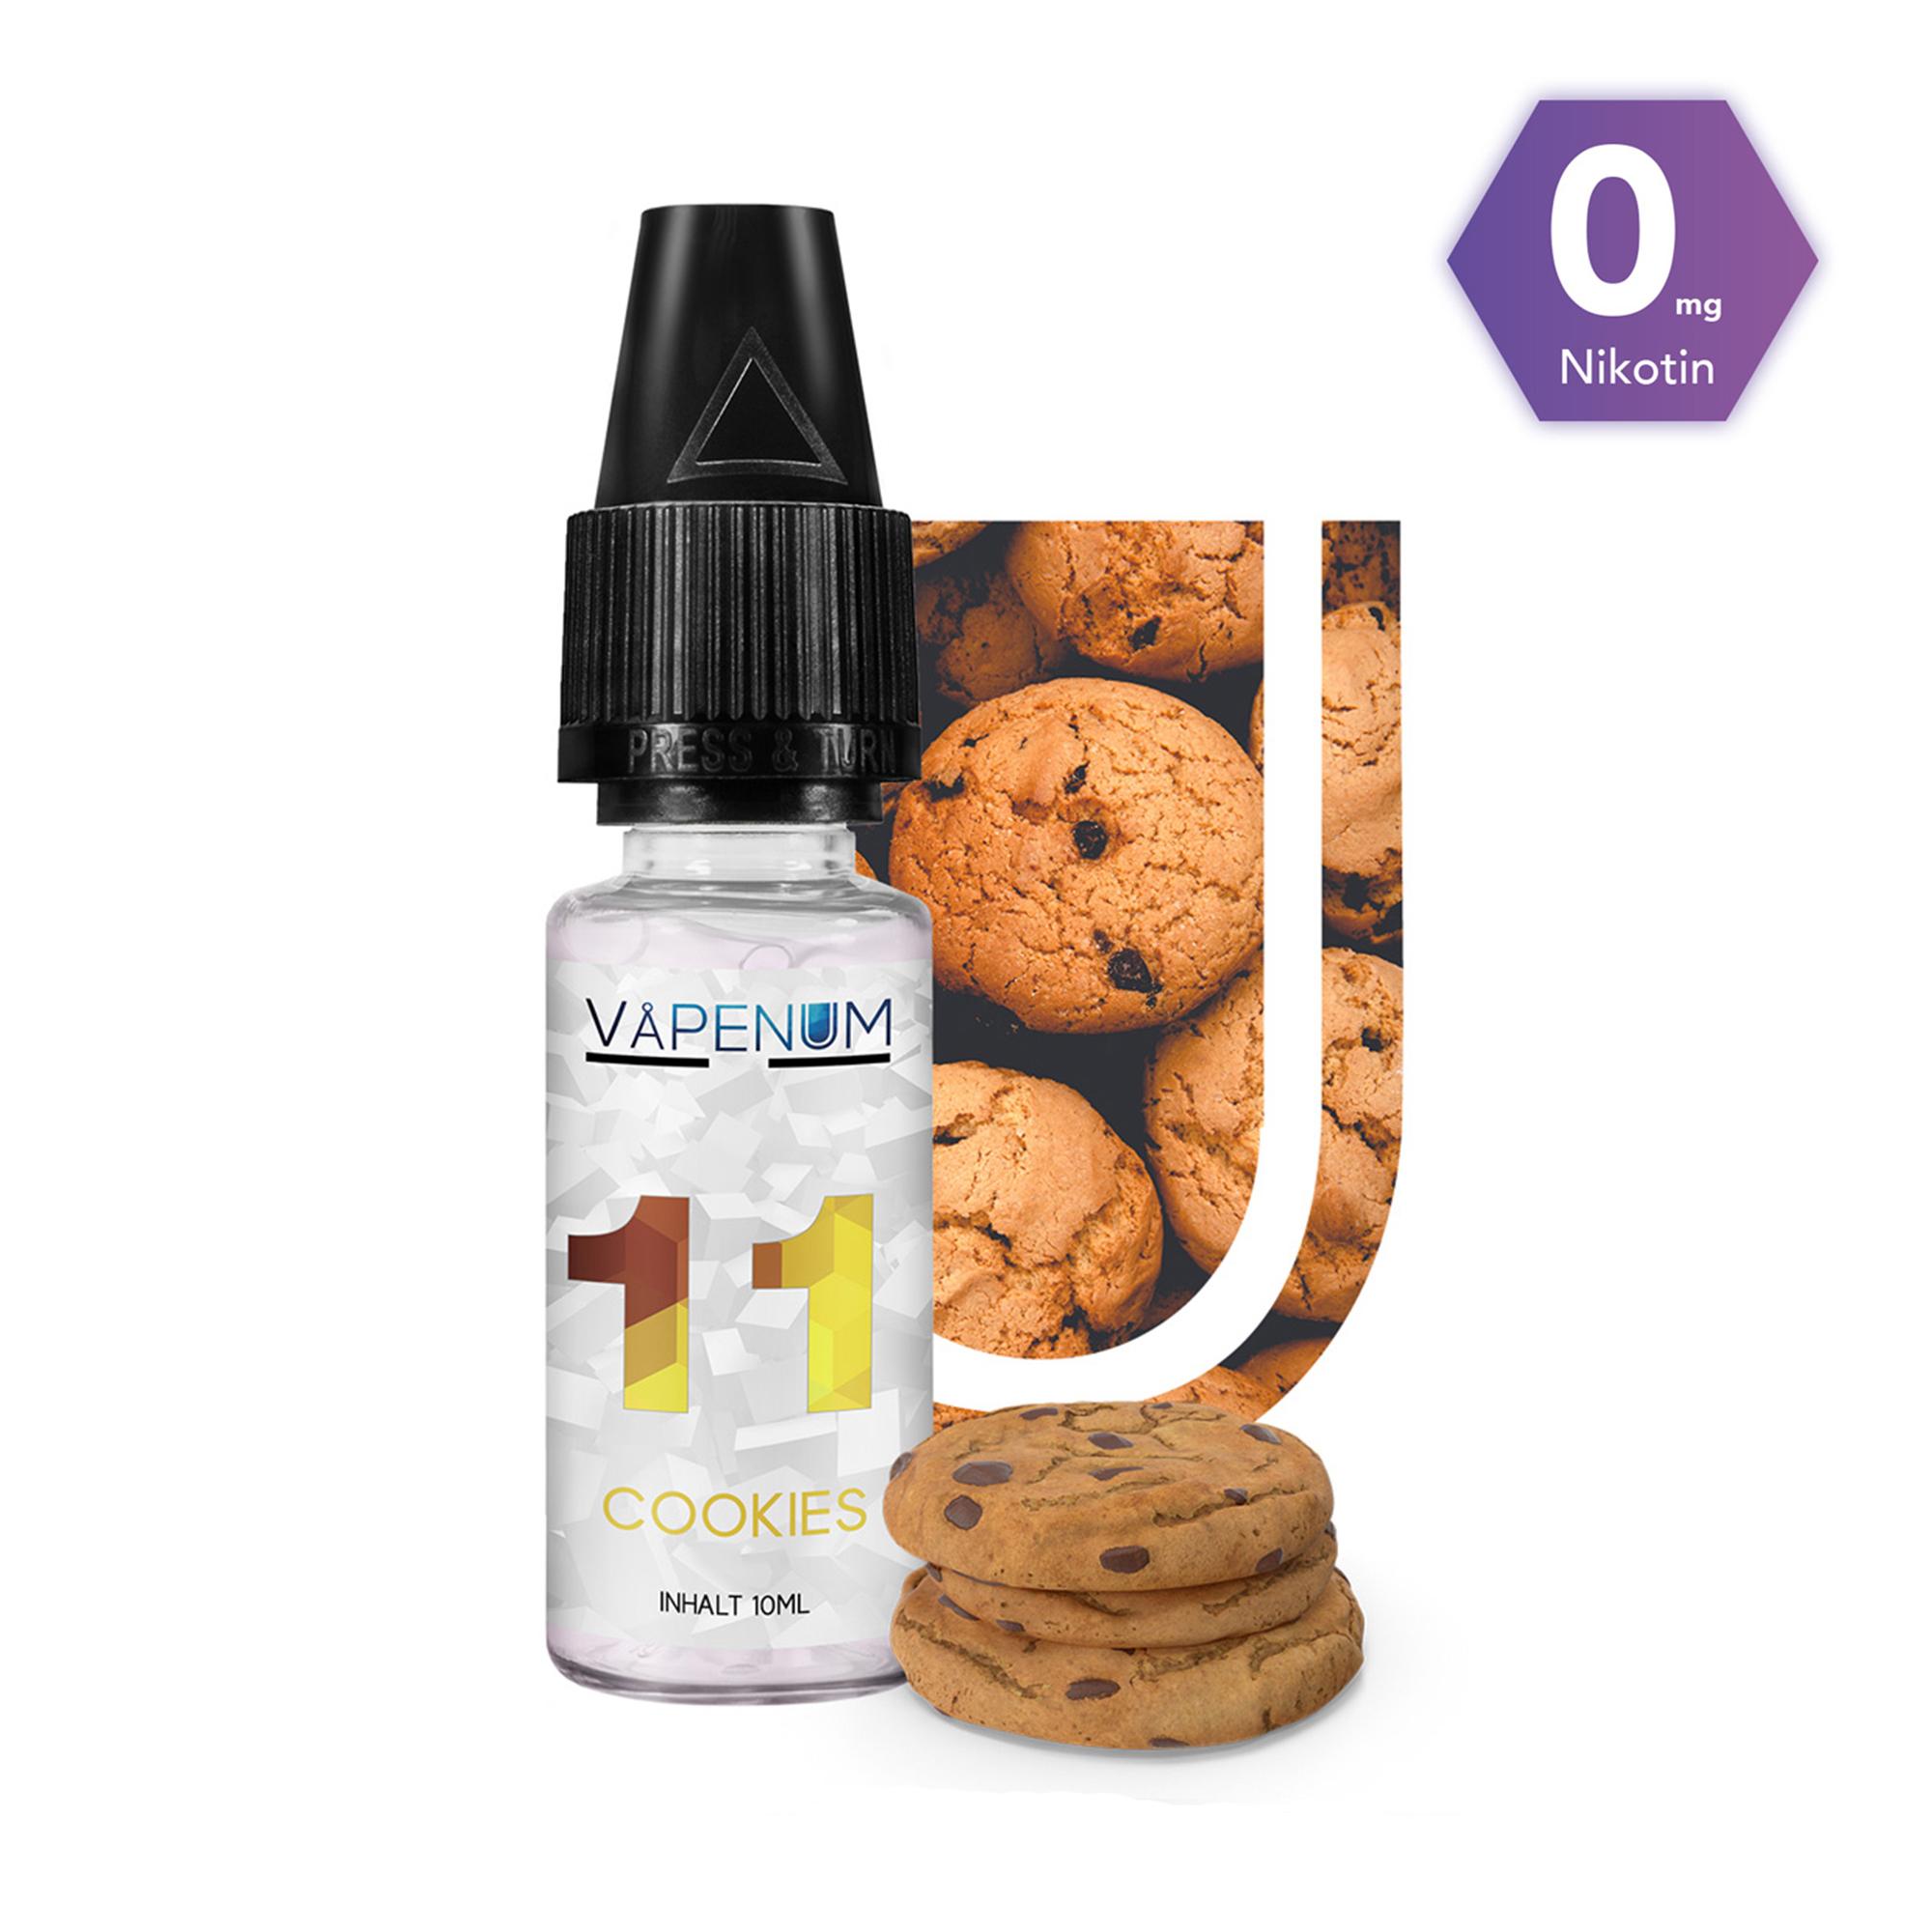 11 - Cookies Liquid by Vapenum